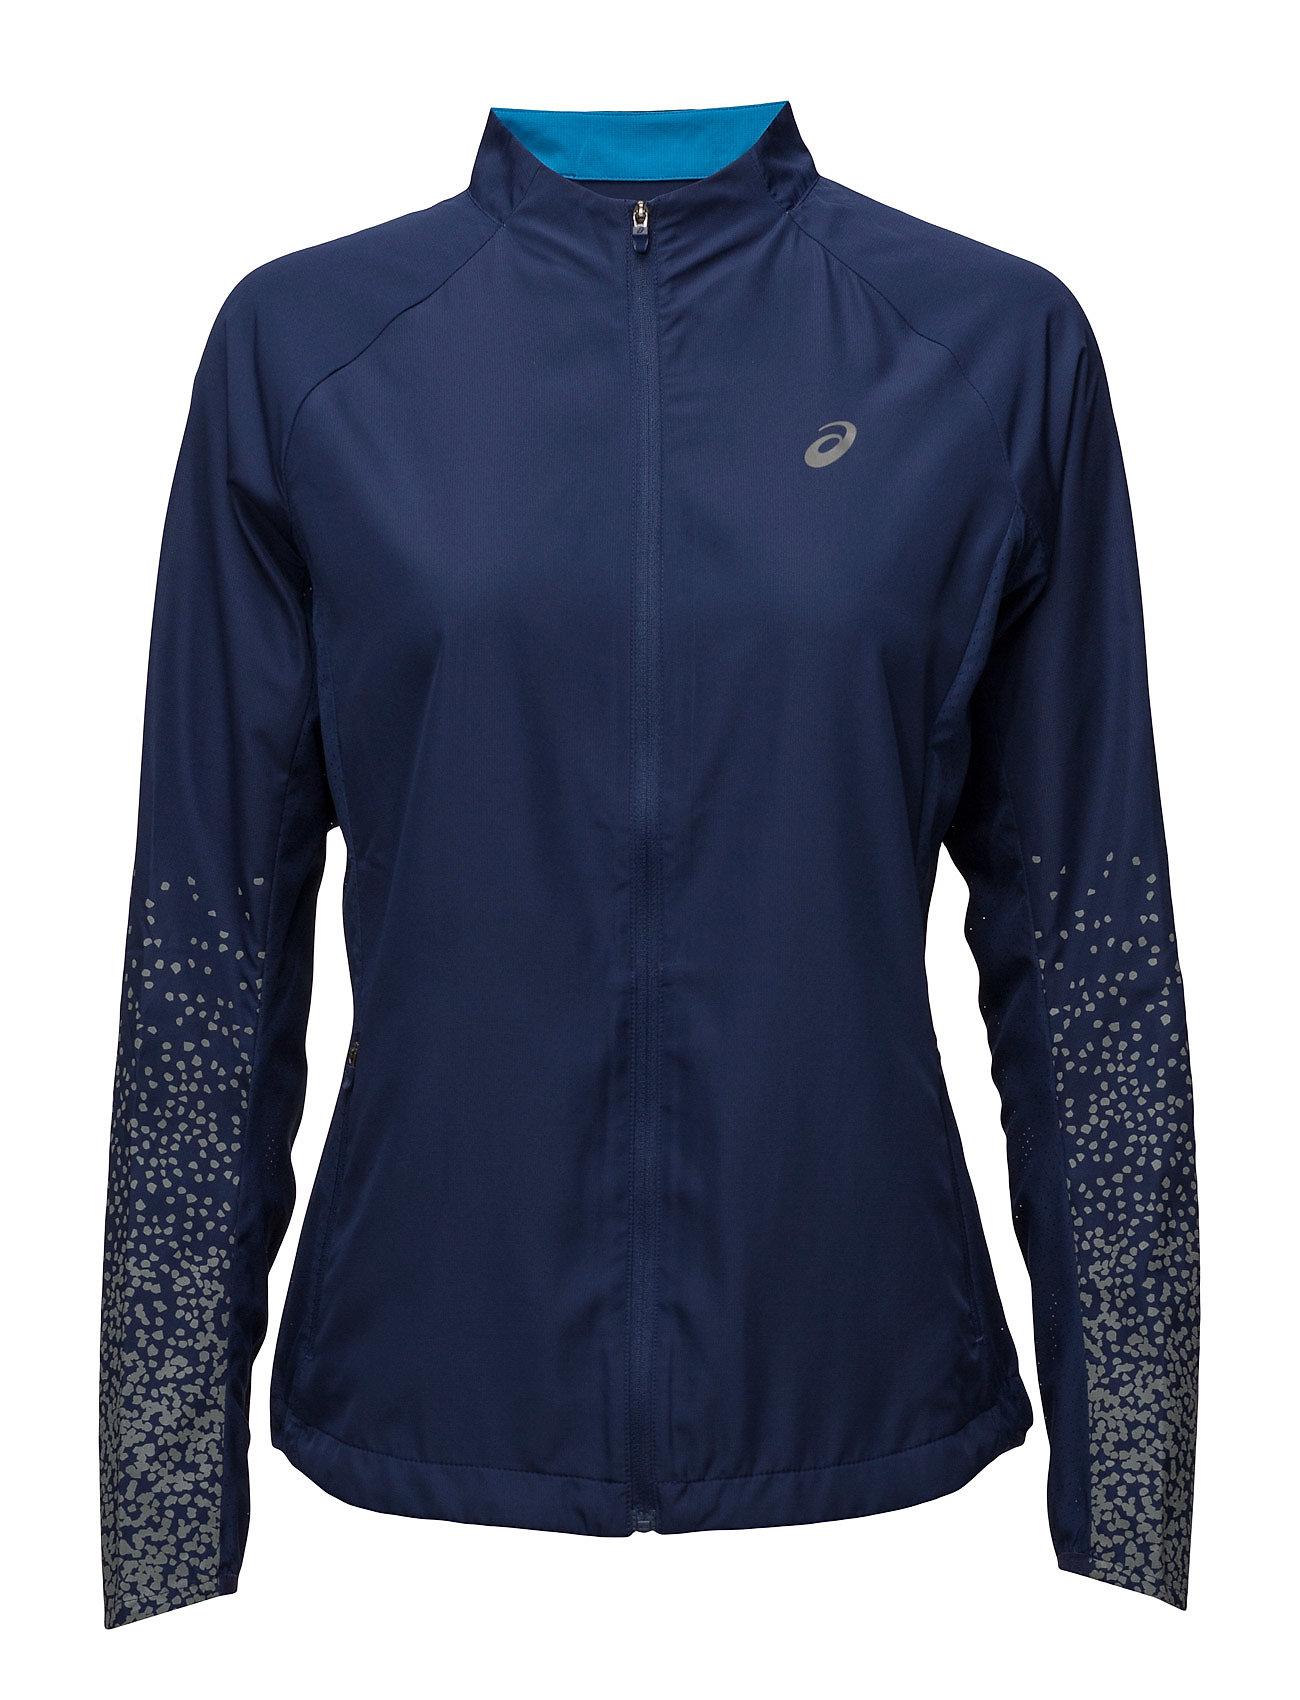 Lite-Show Jacket Asics Sportsjakker til Kvinder i